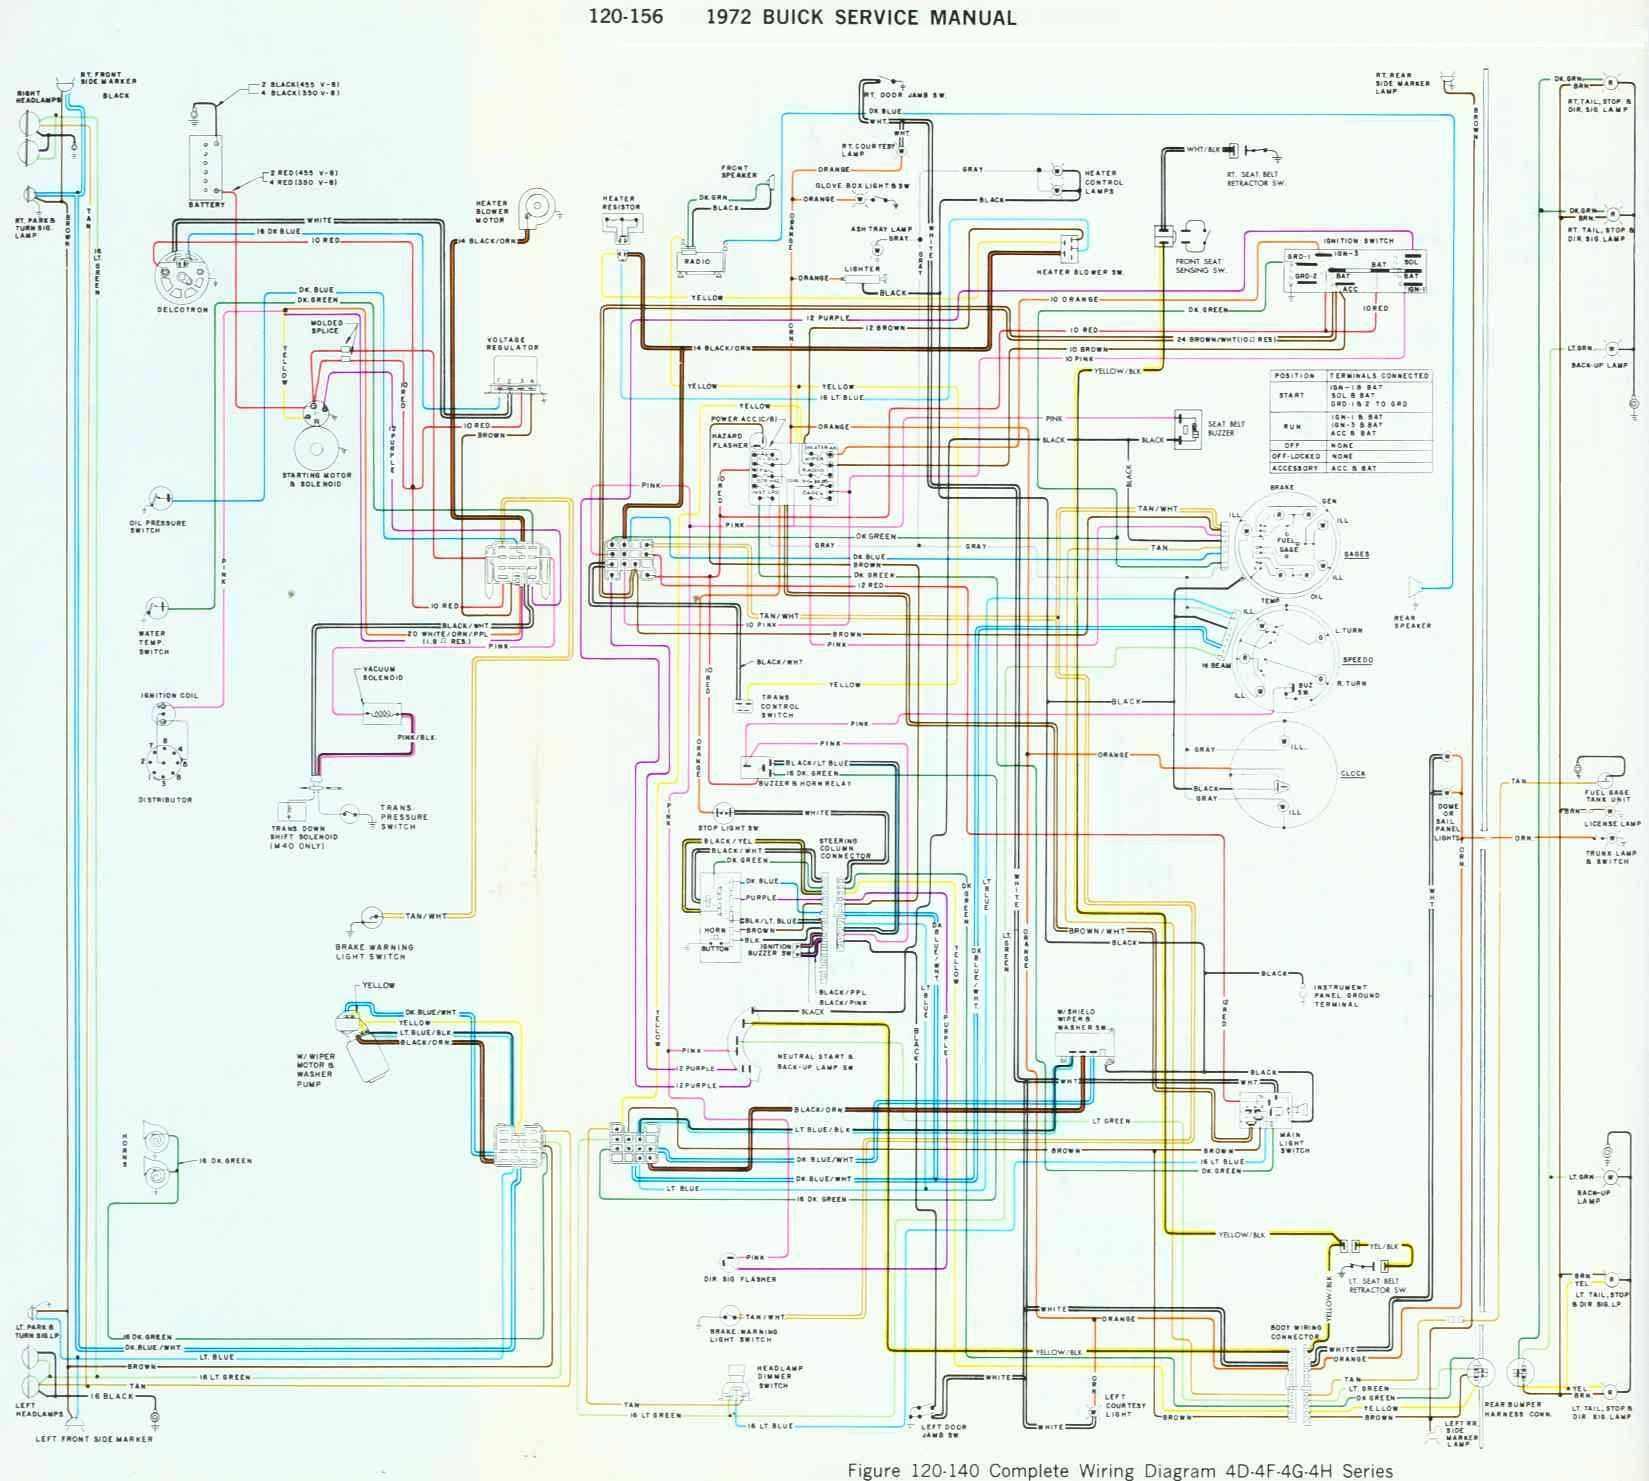 1972 buick skylark wiring diagram   wiring diagram  wiring diagram - autoscout24